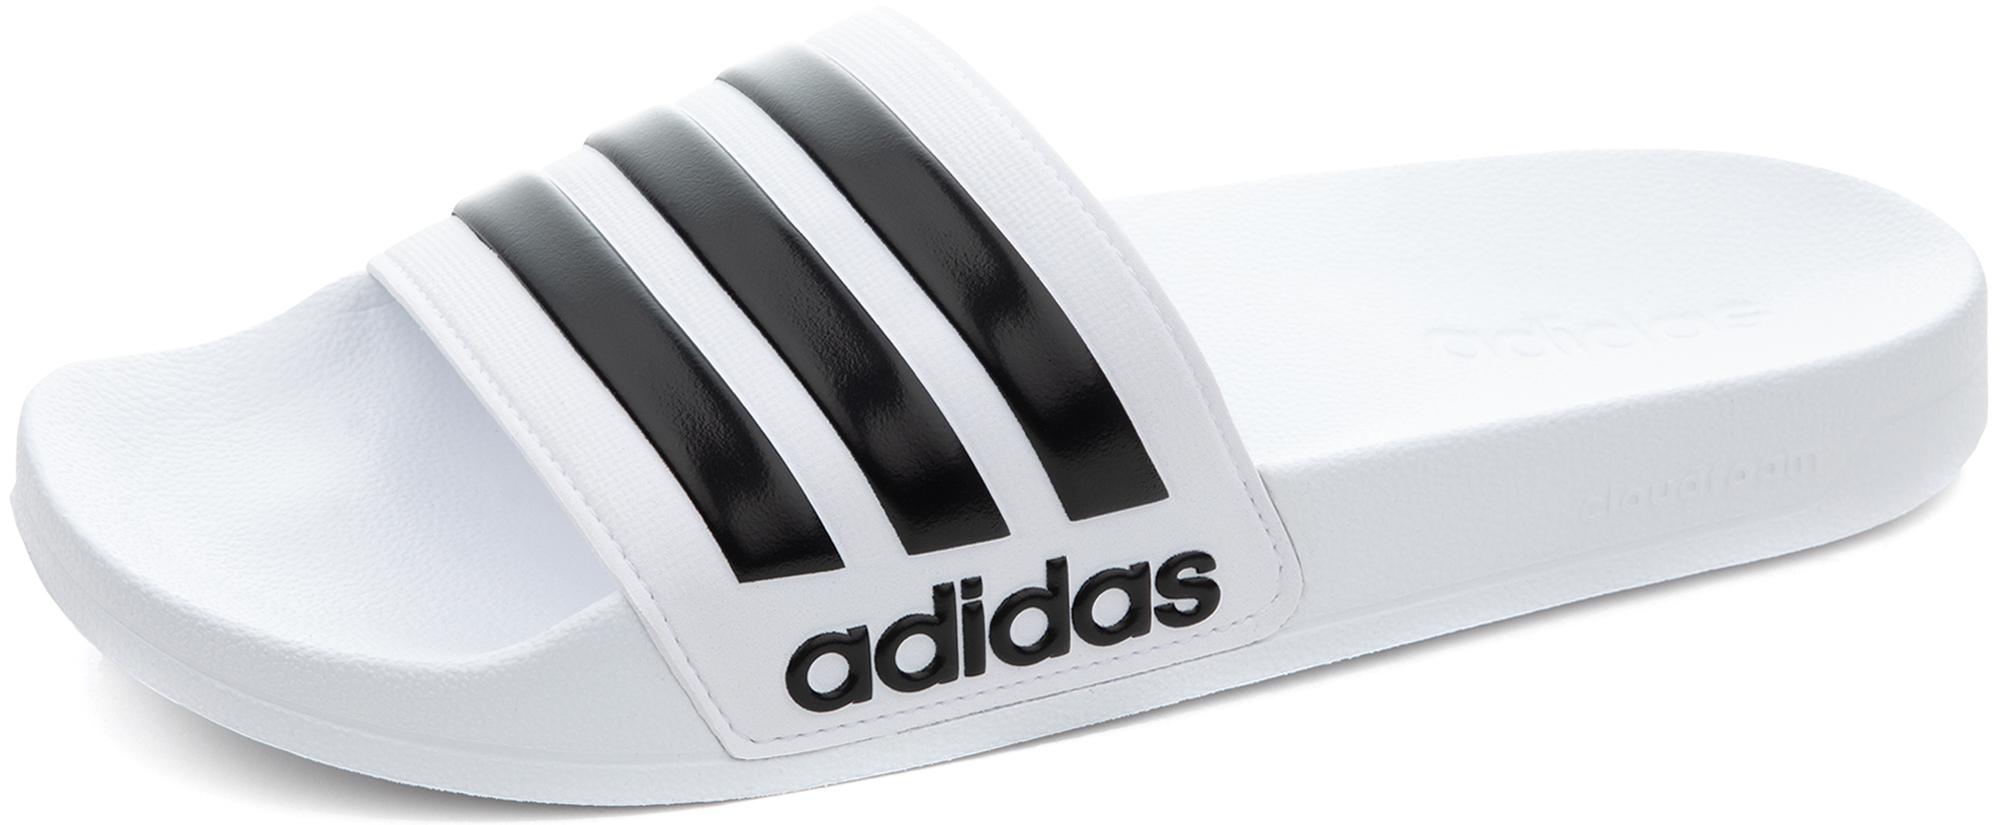 Adidas Шлепанцы мужские Adidas Adilette Shower, размер 46 цена в Москве и Питере